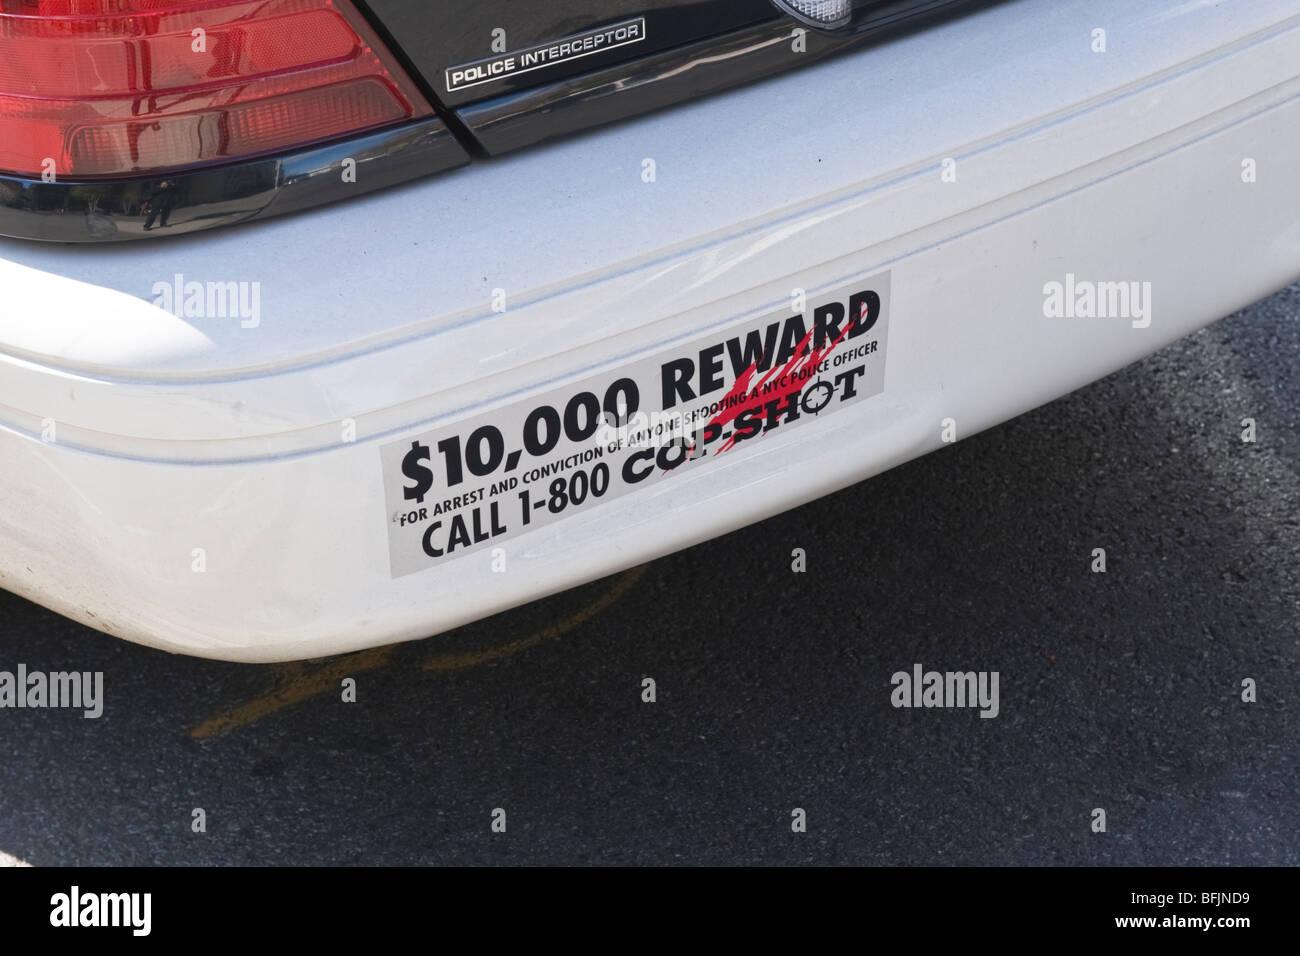 New york city the big apple police car bumper sticker 10000 reward on conviction of cop